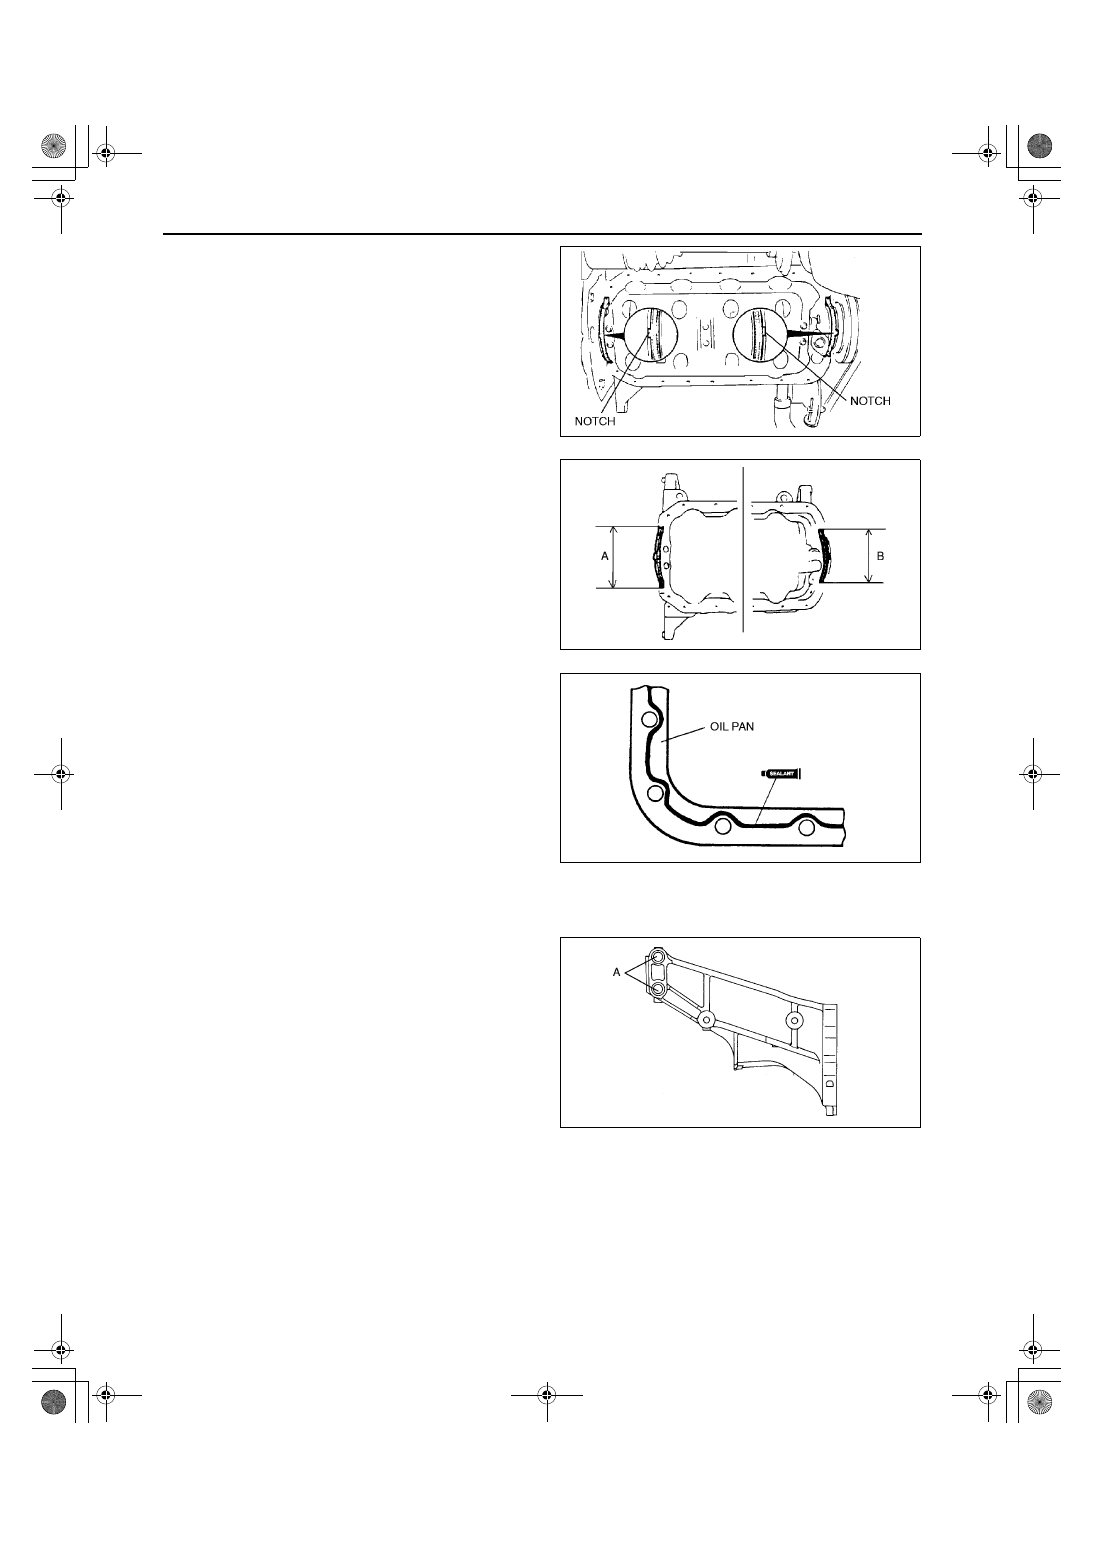 mazda protege 5 manual part 132 rh zinref ru Transaxle vs Transmission Ford Manual Transaxle